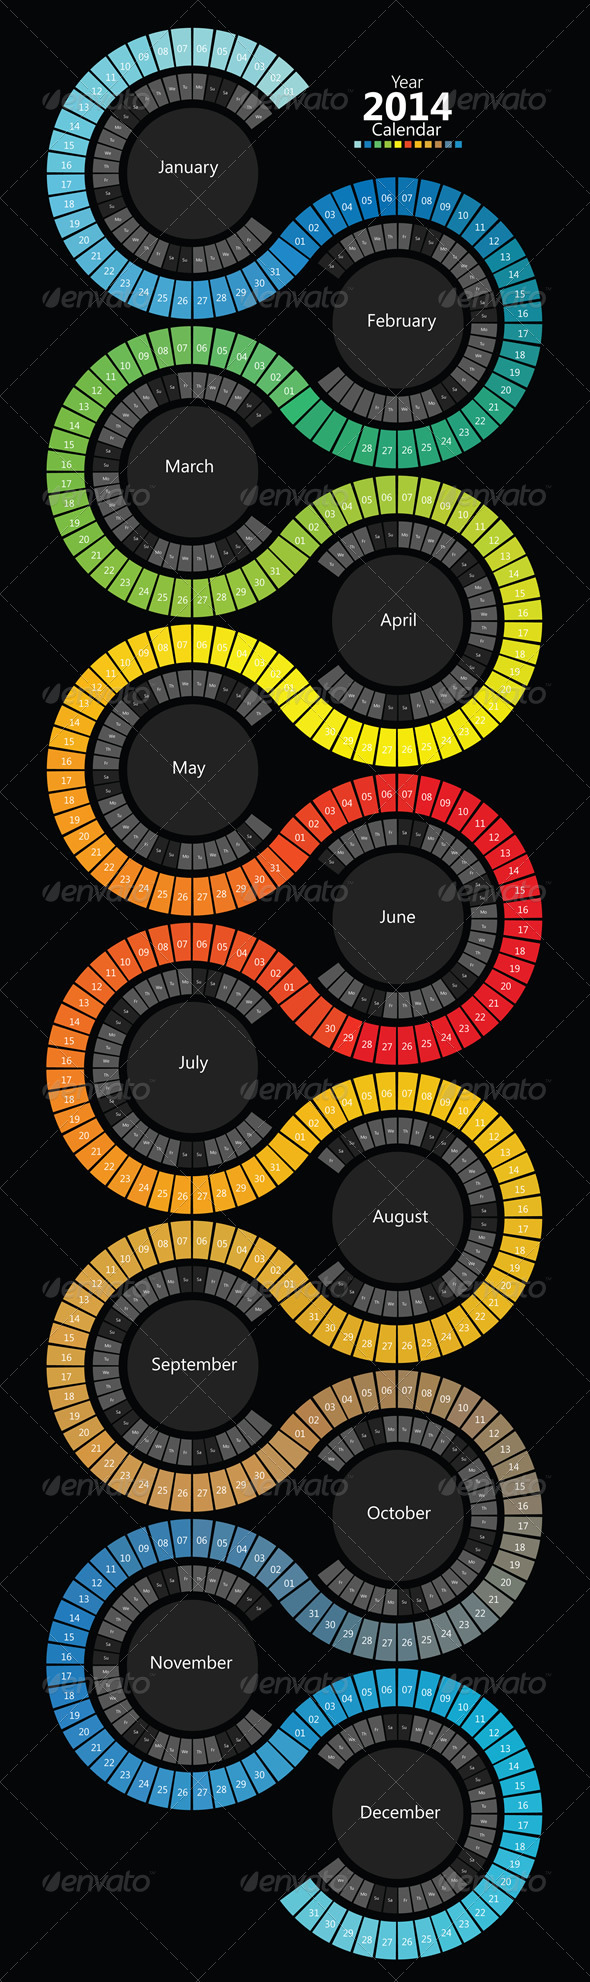 GraphicRiver 2014 Spectrum Swirl Calendar 6413900